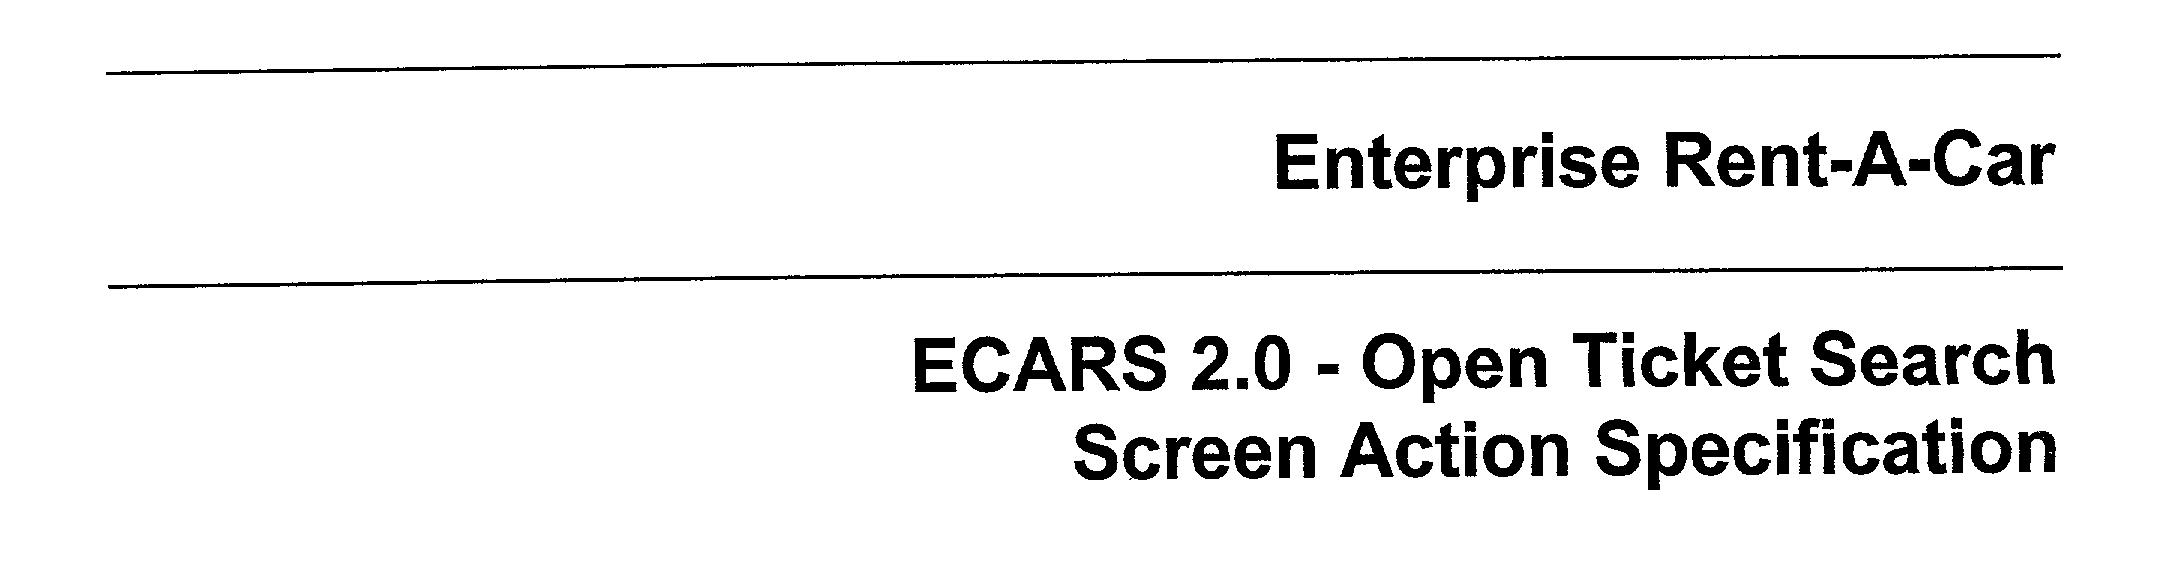 Figure US20030125992A1-20030703-P01744